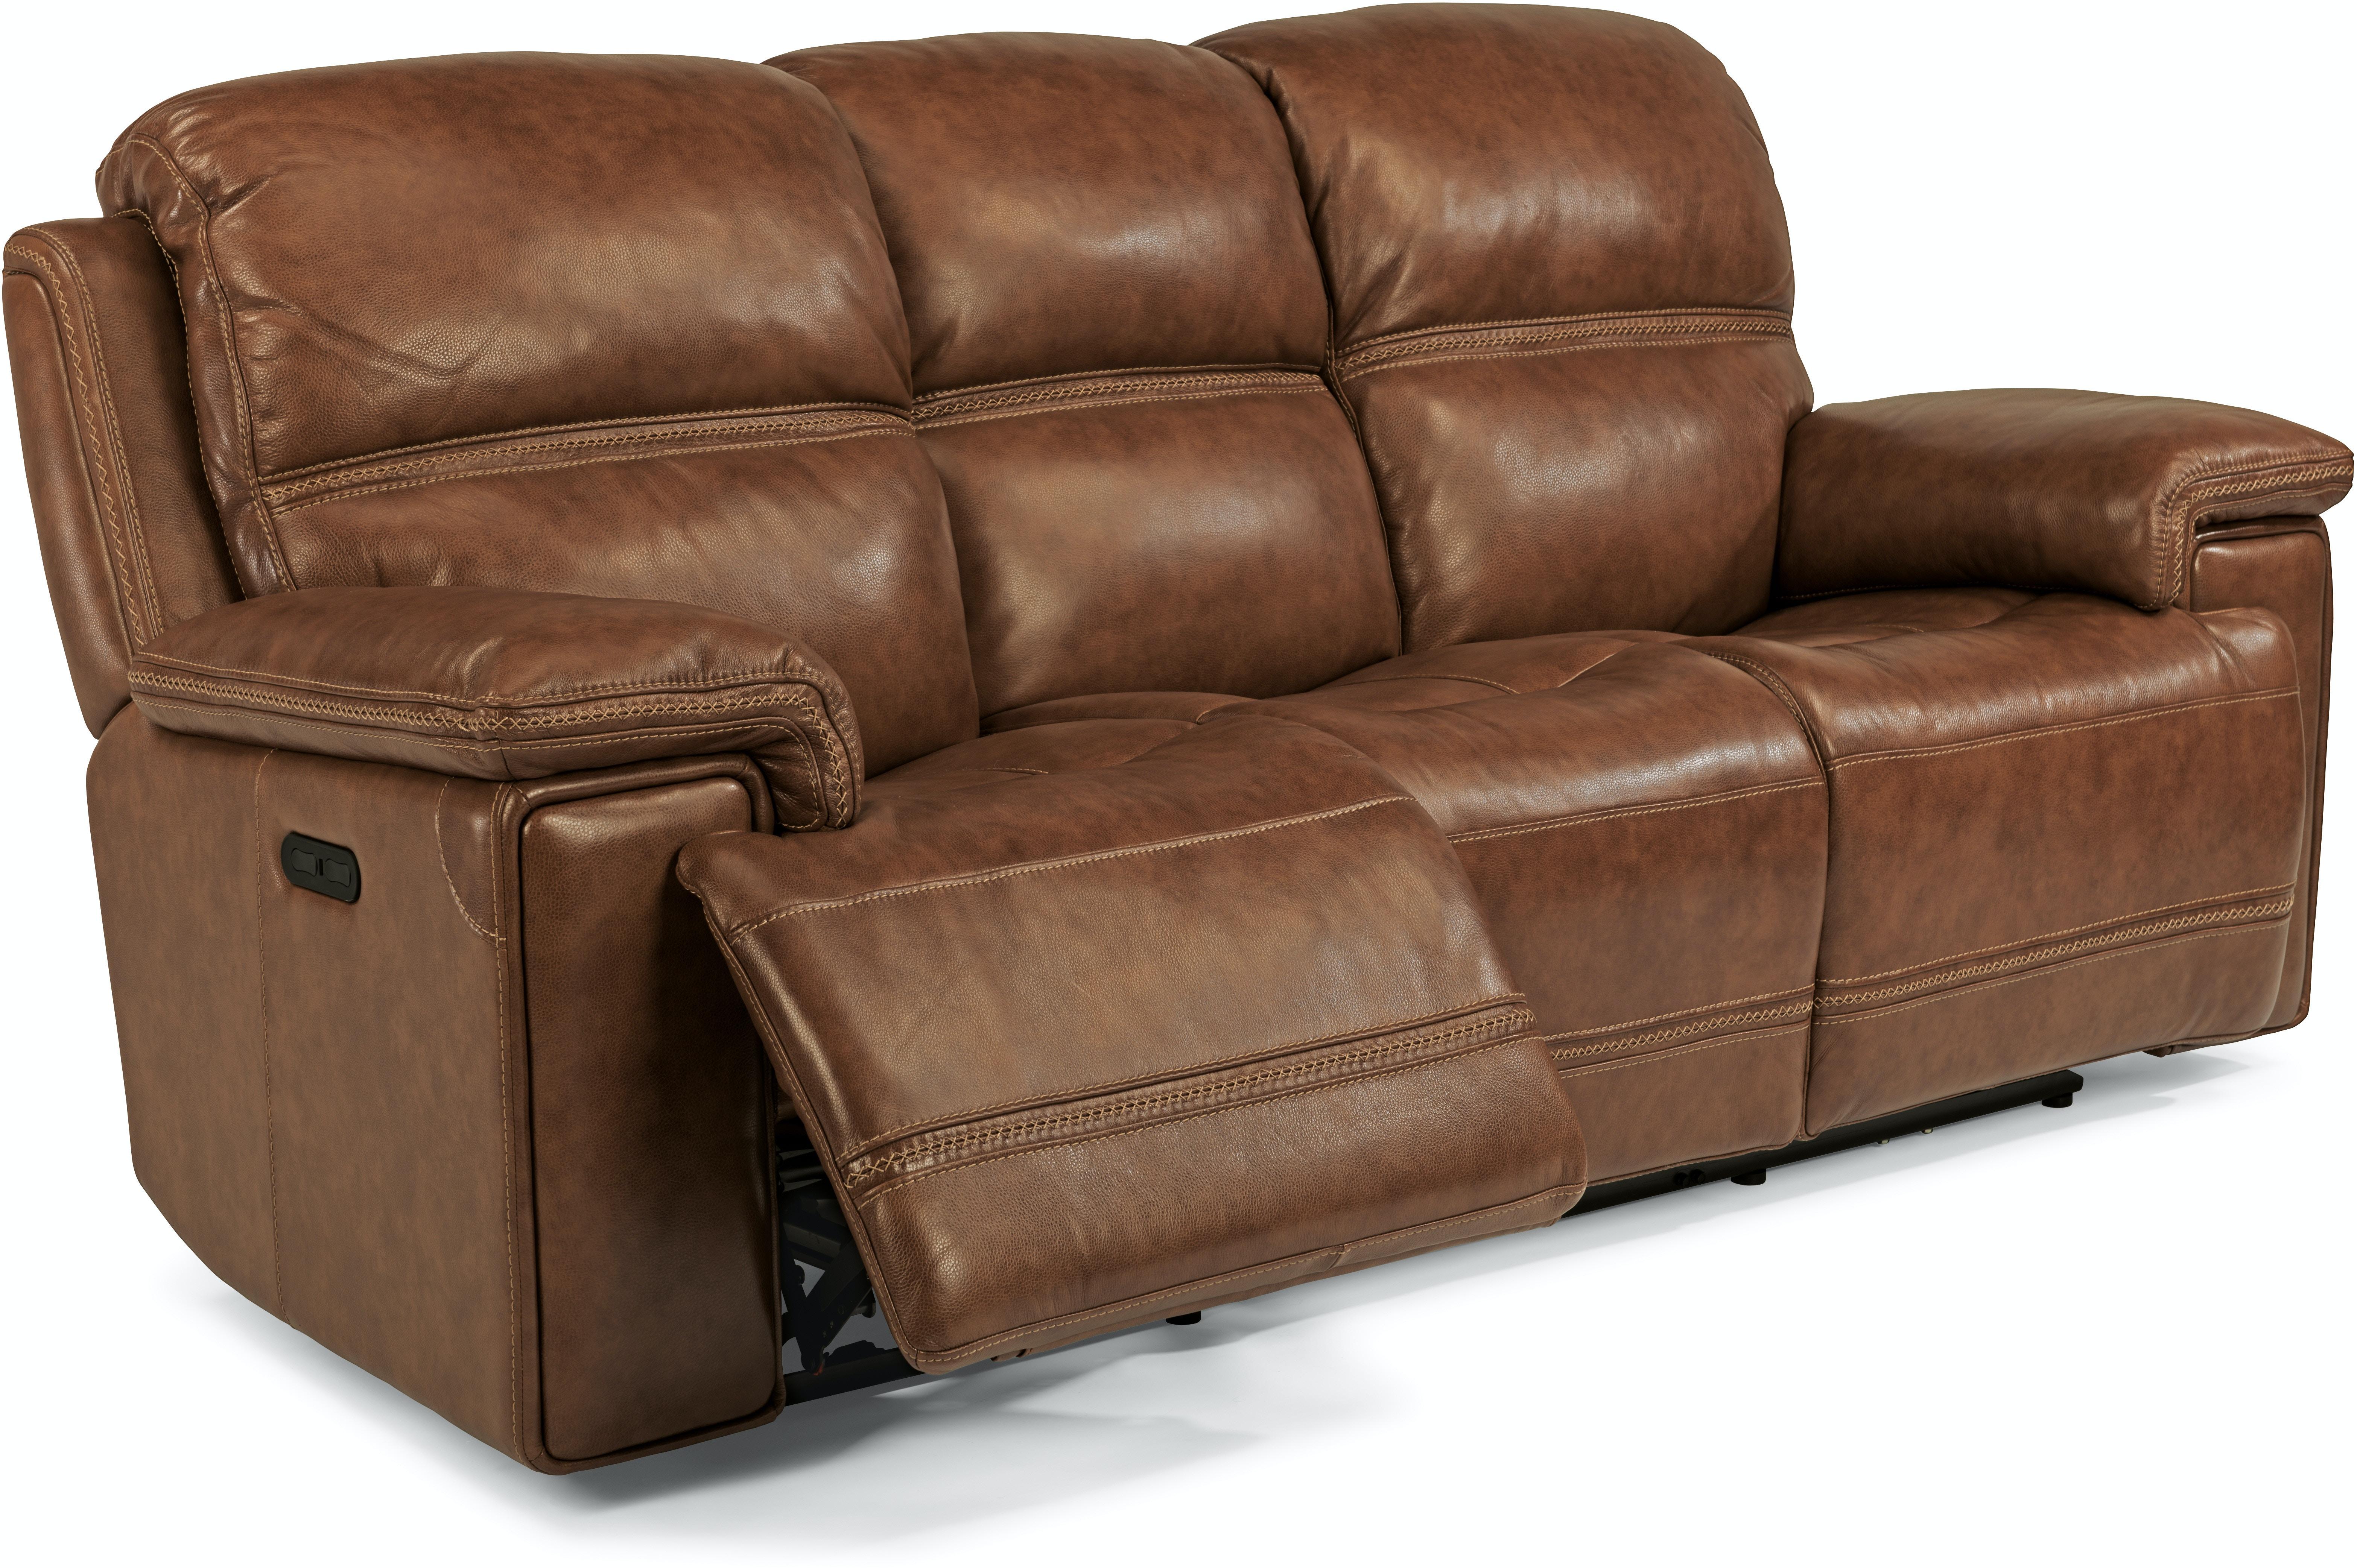 Flexsteel Digby Sofa Price Flexsteel Sofas Sofa Price Is